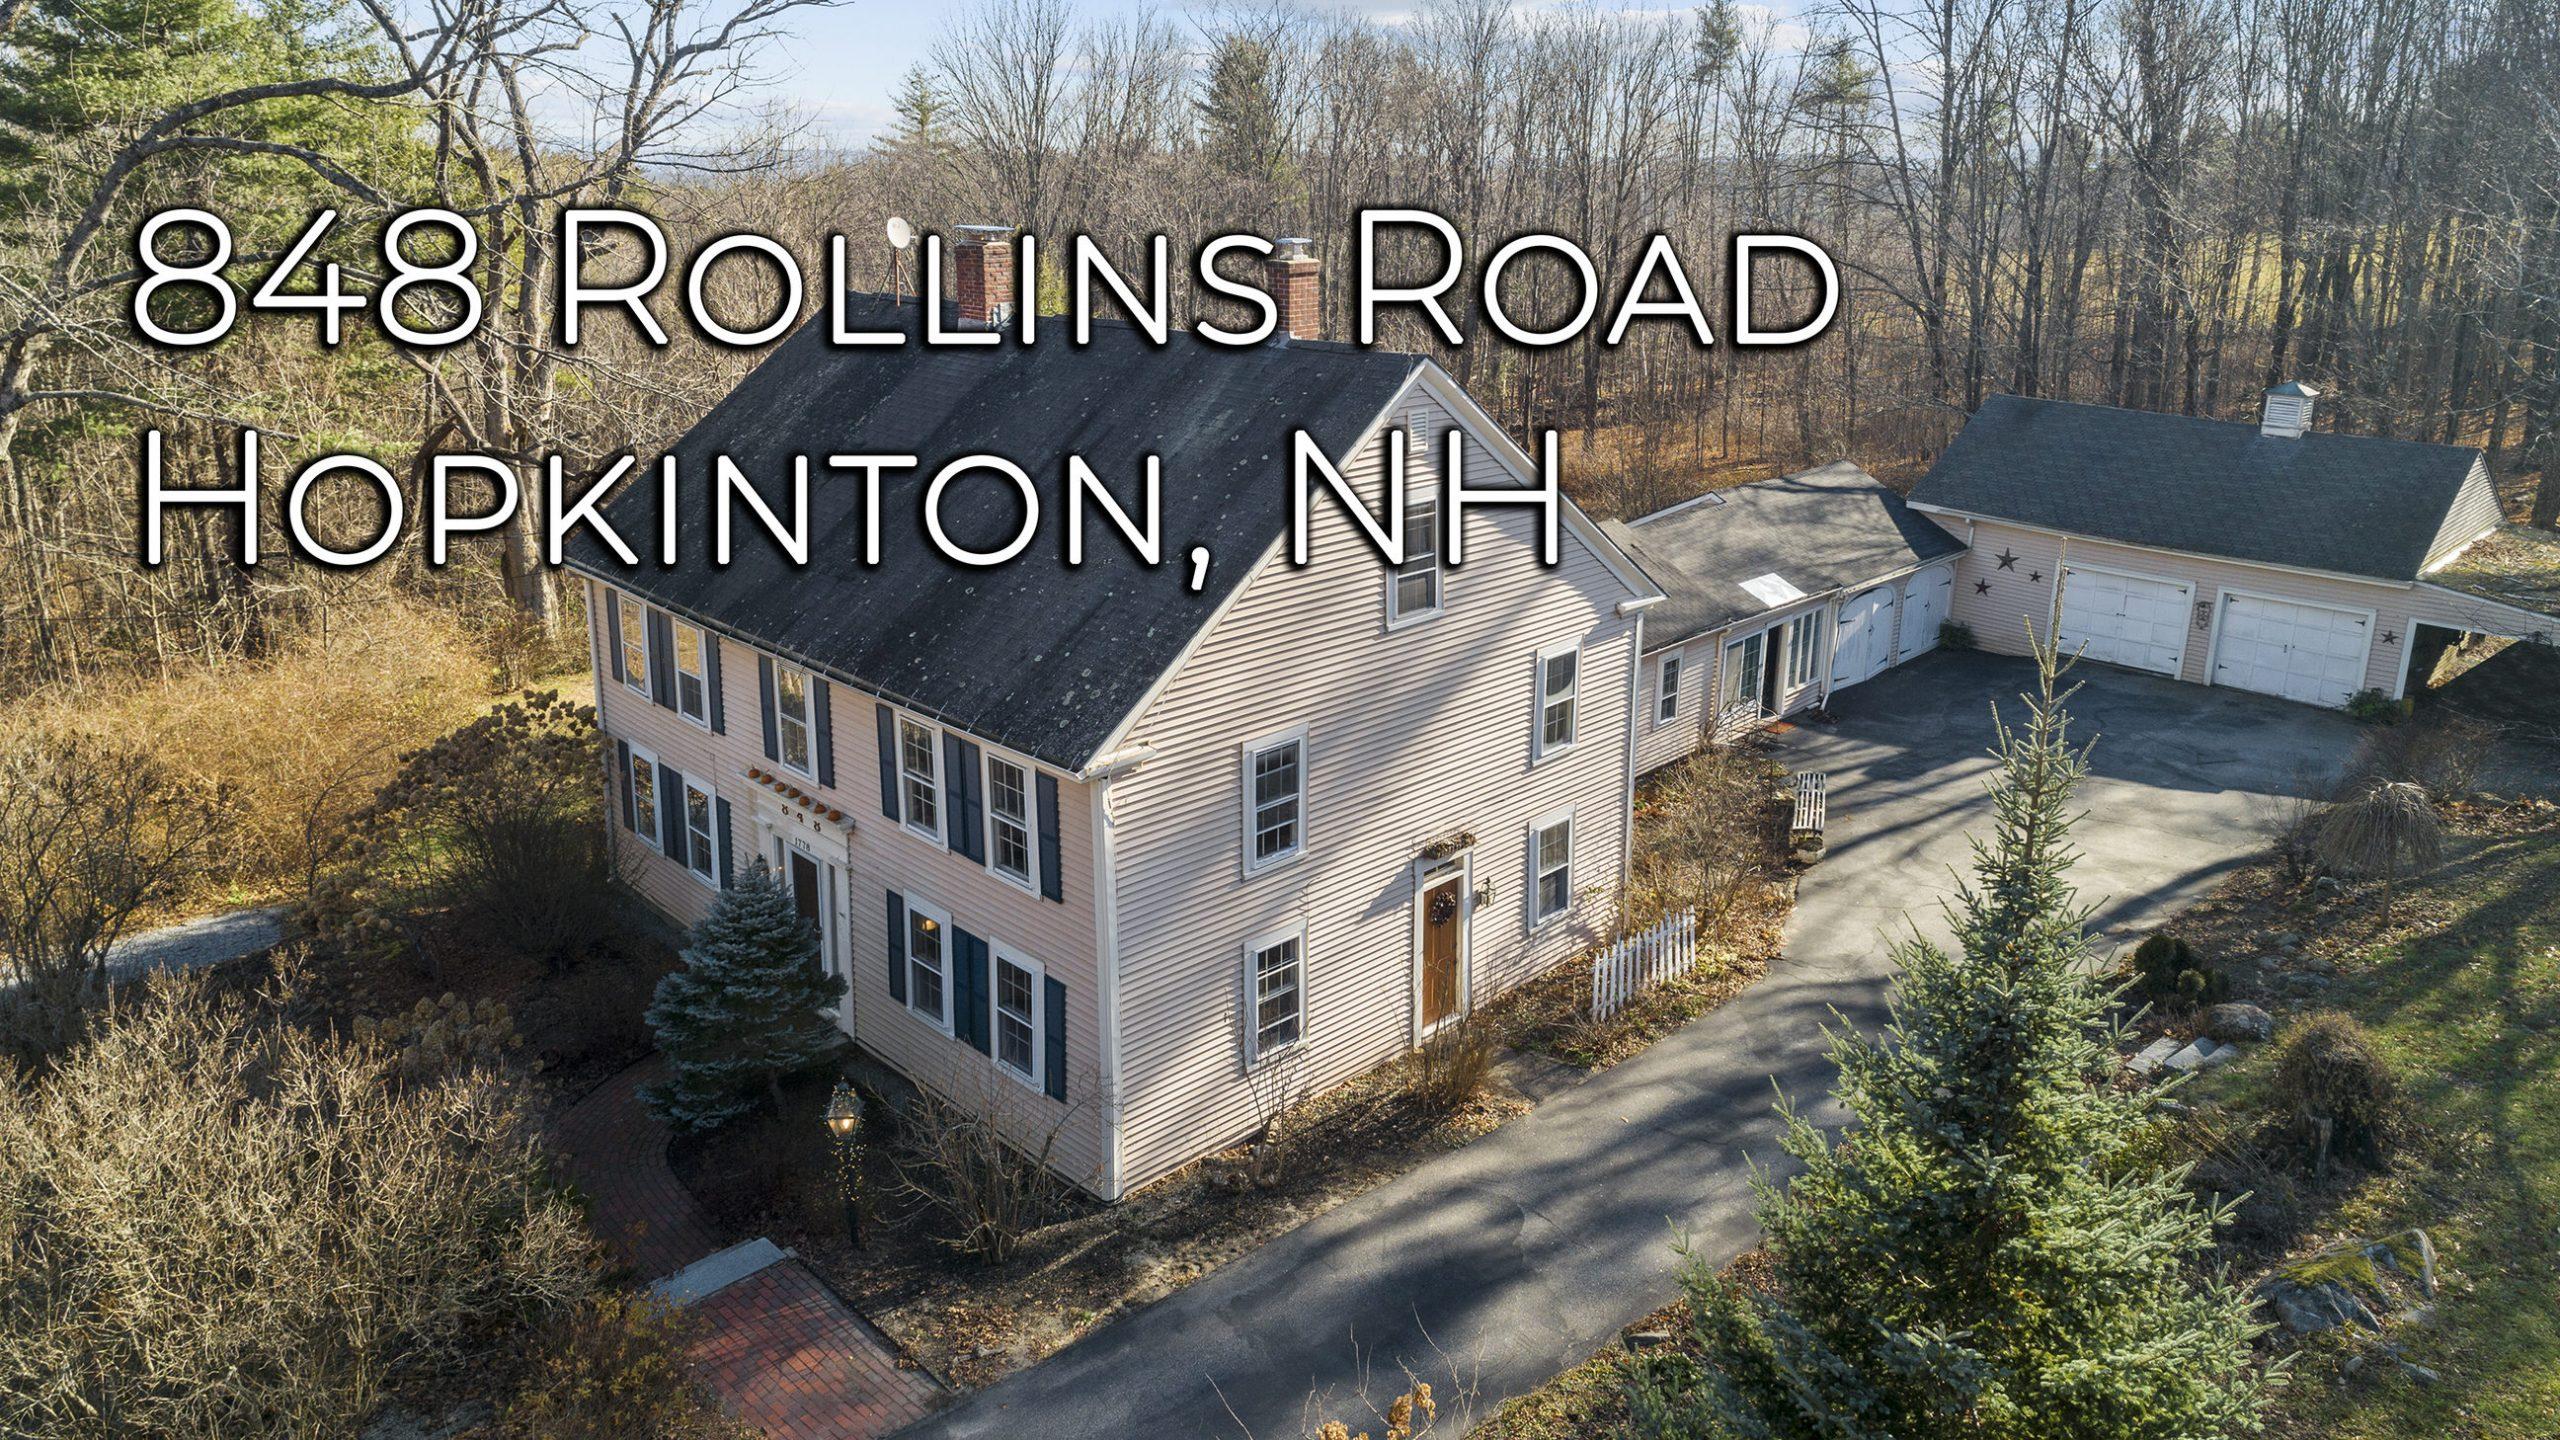 848 Rollins Rd Hopkinton NH 03229